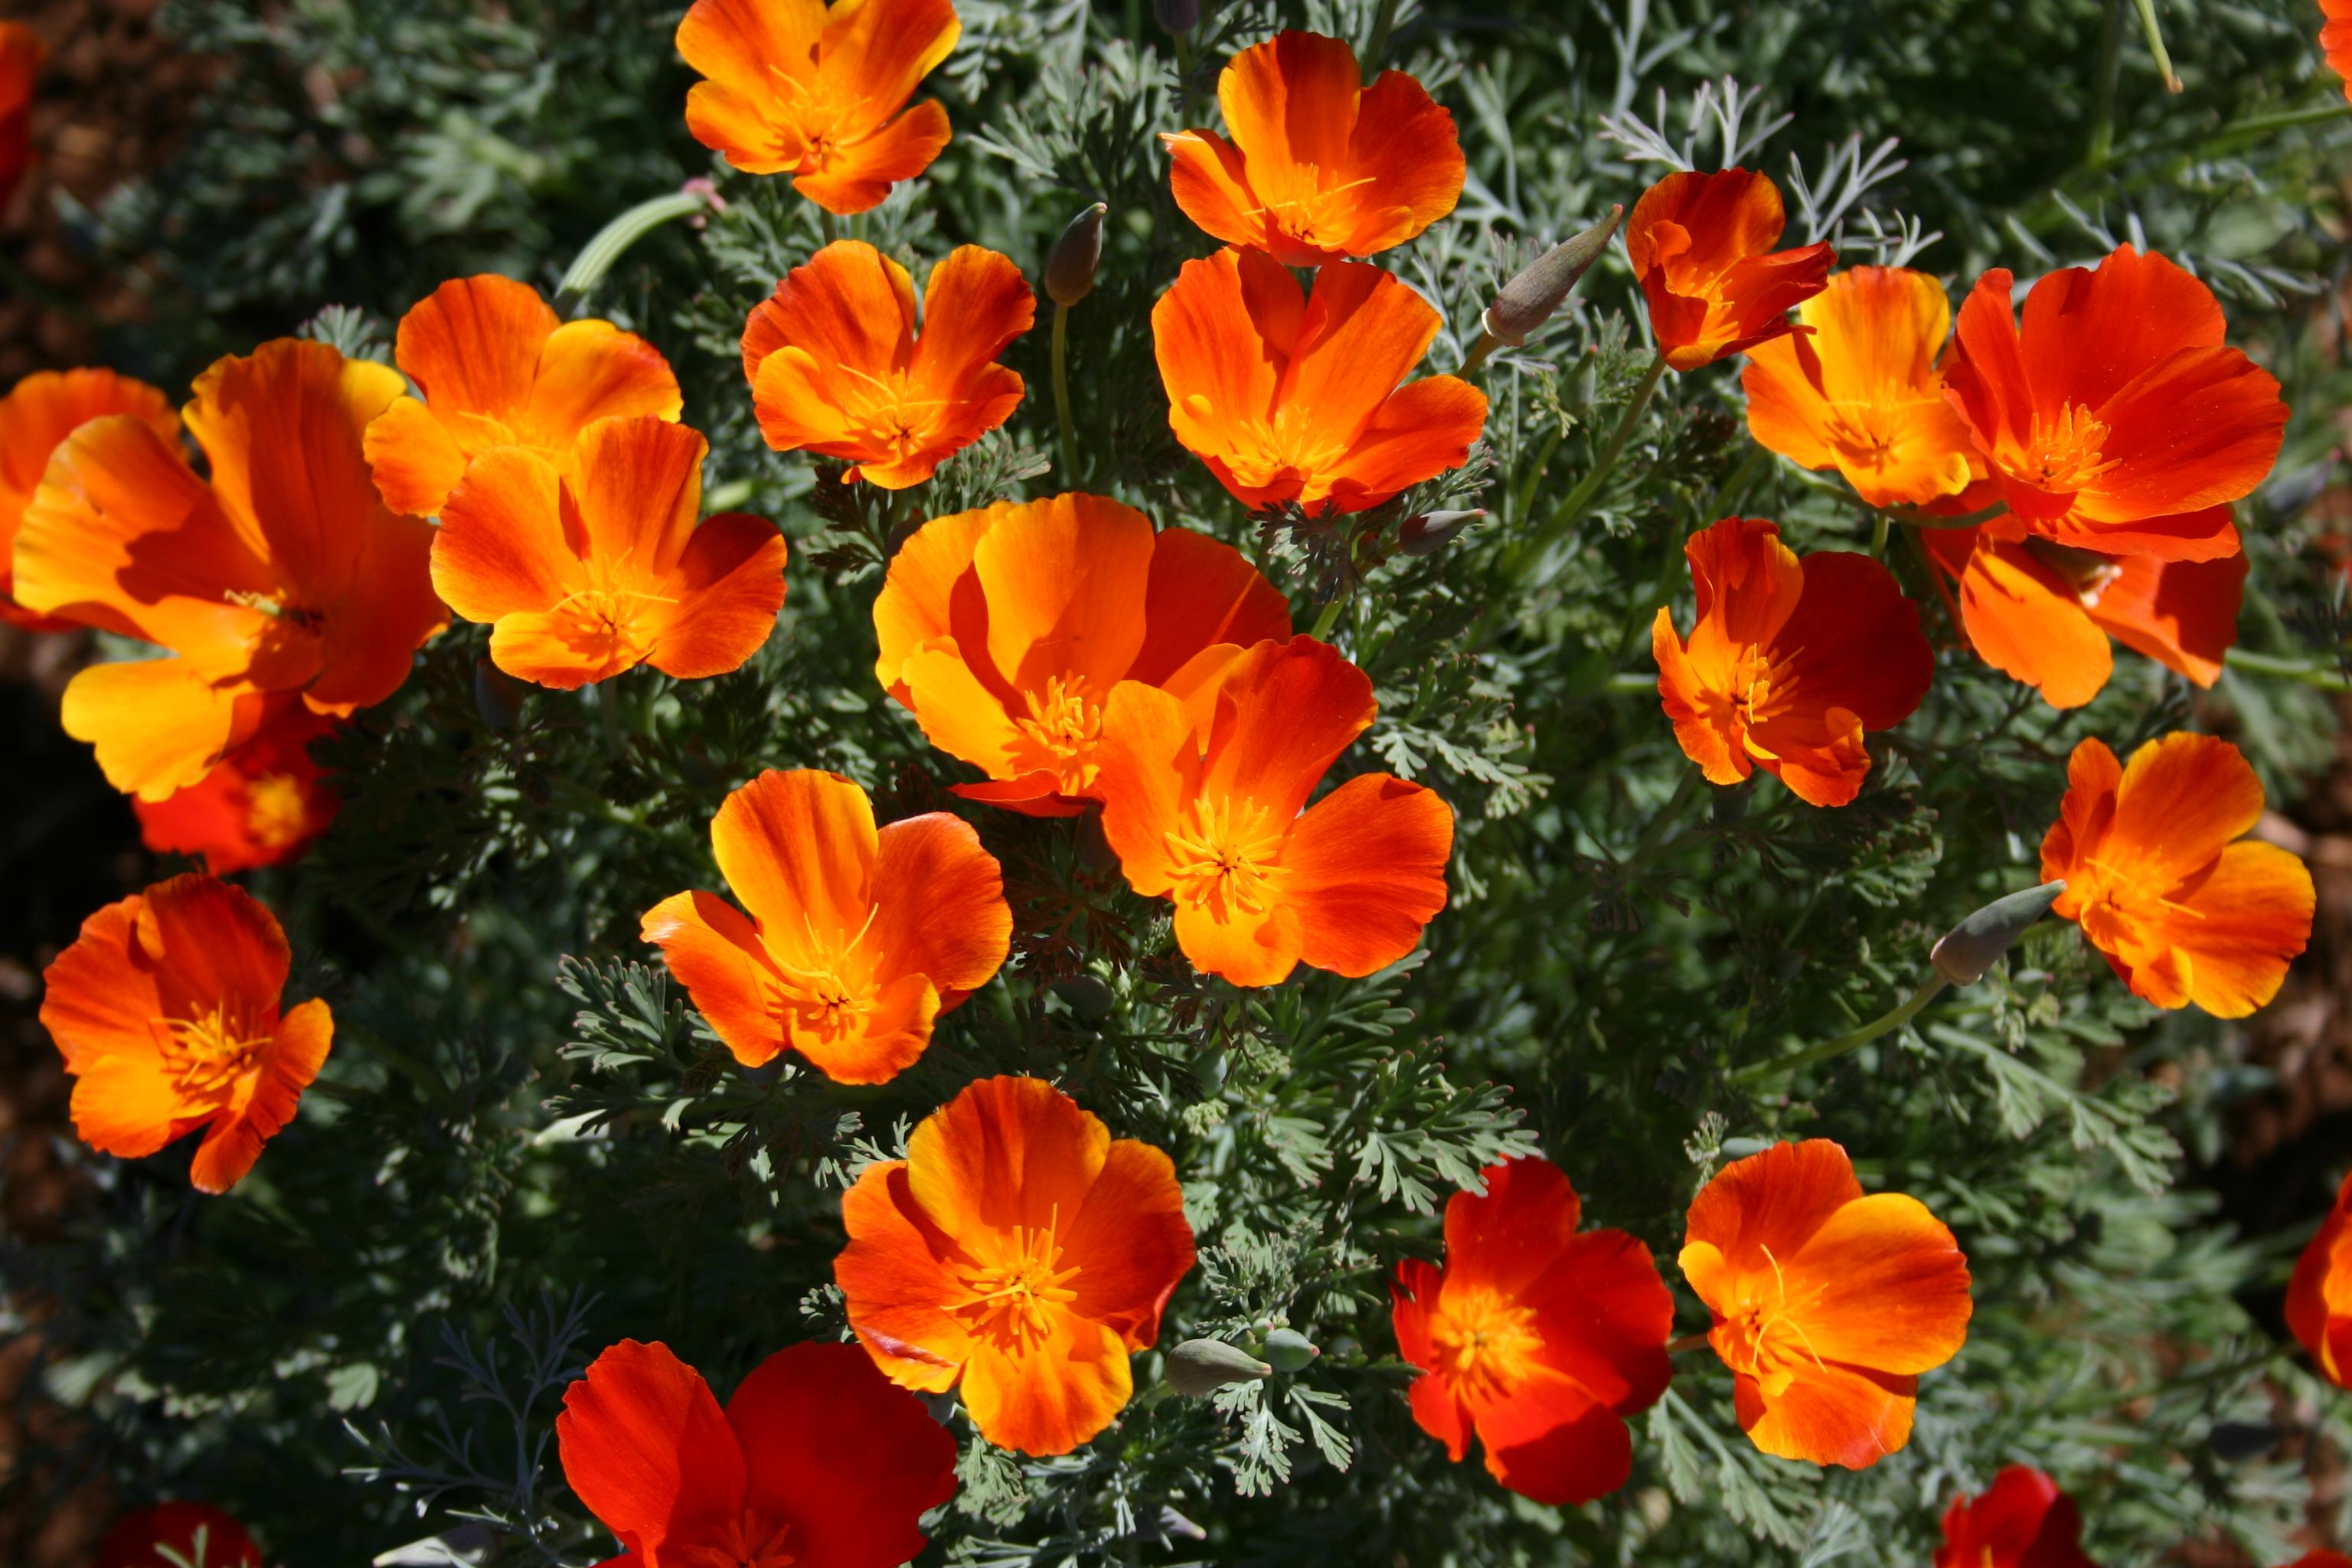 Poppy California Mikado Oregon Wholesale Seed Company